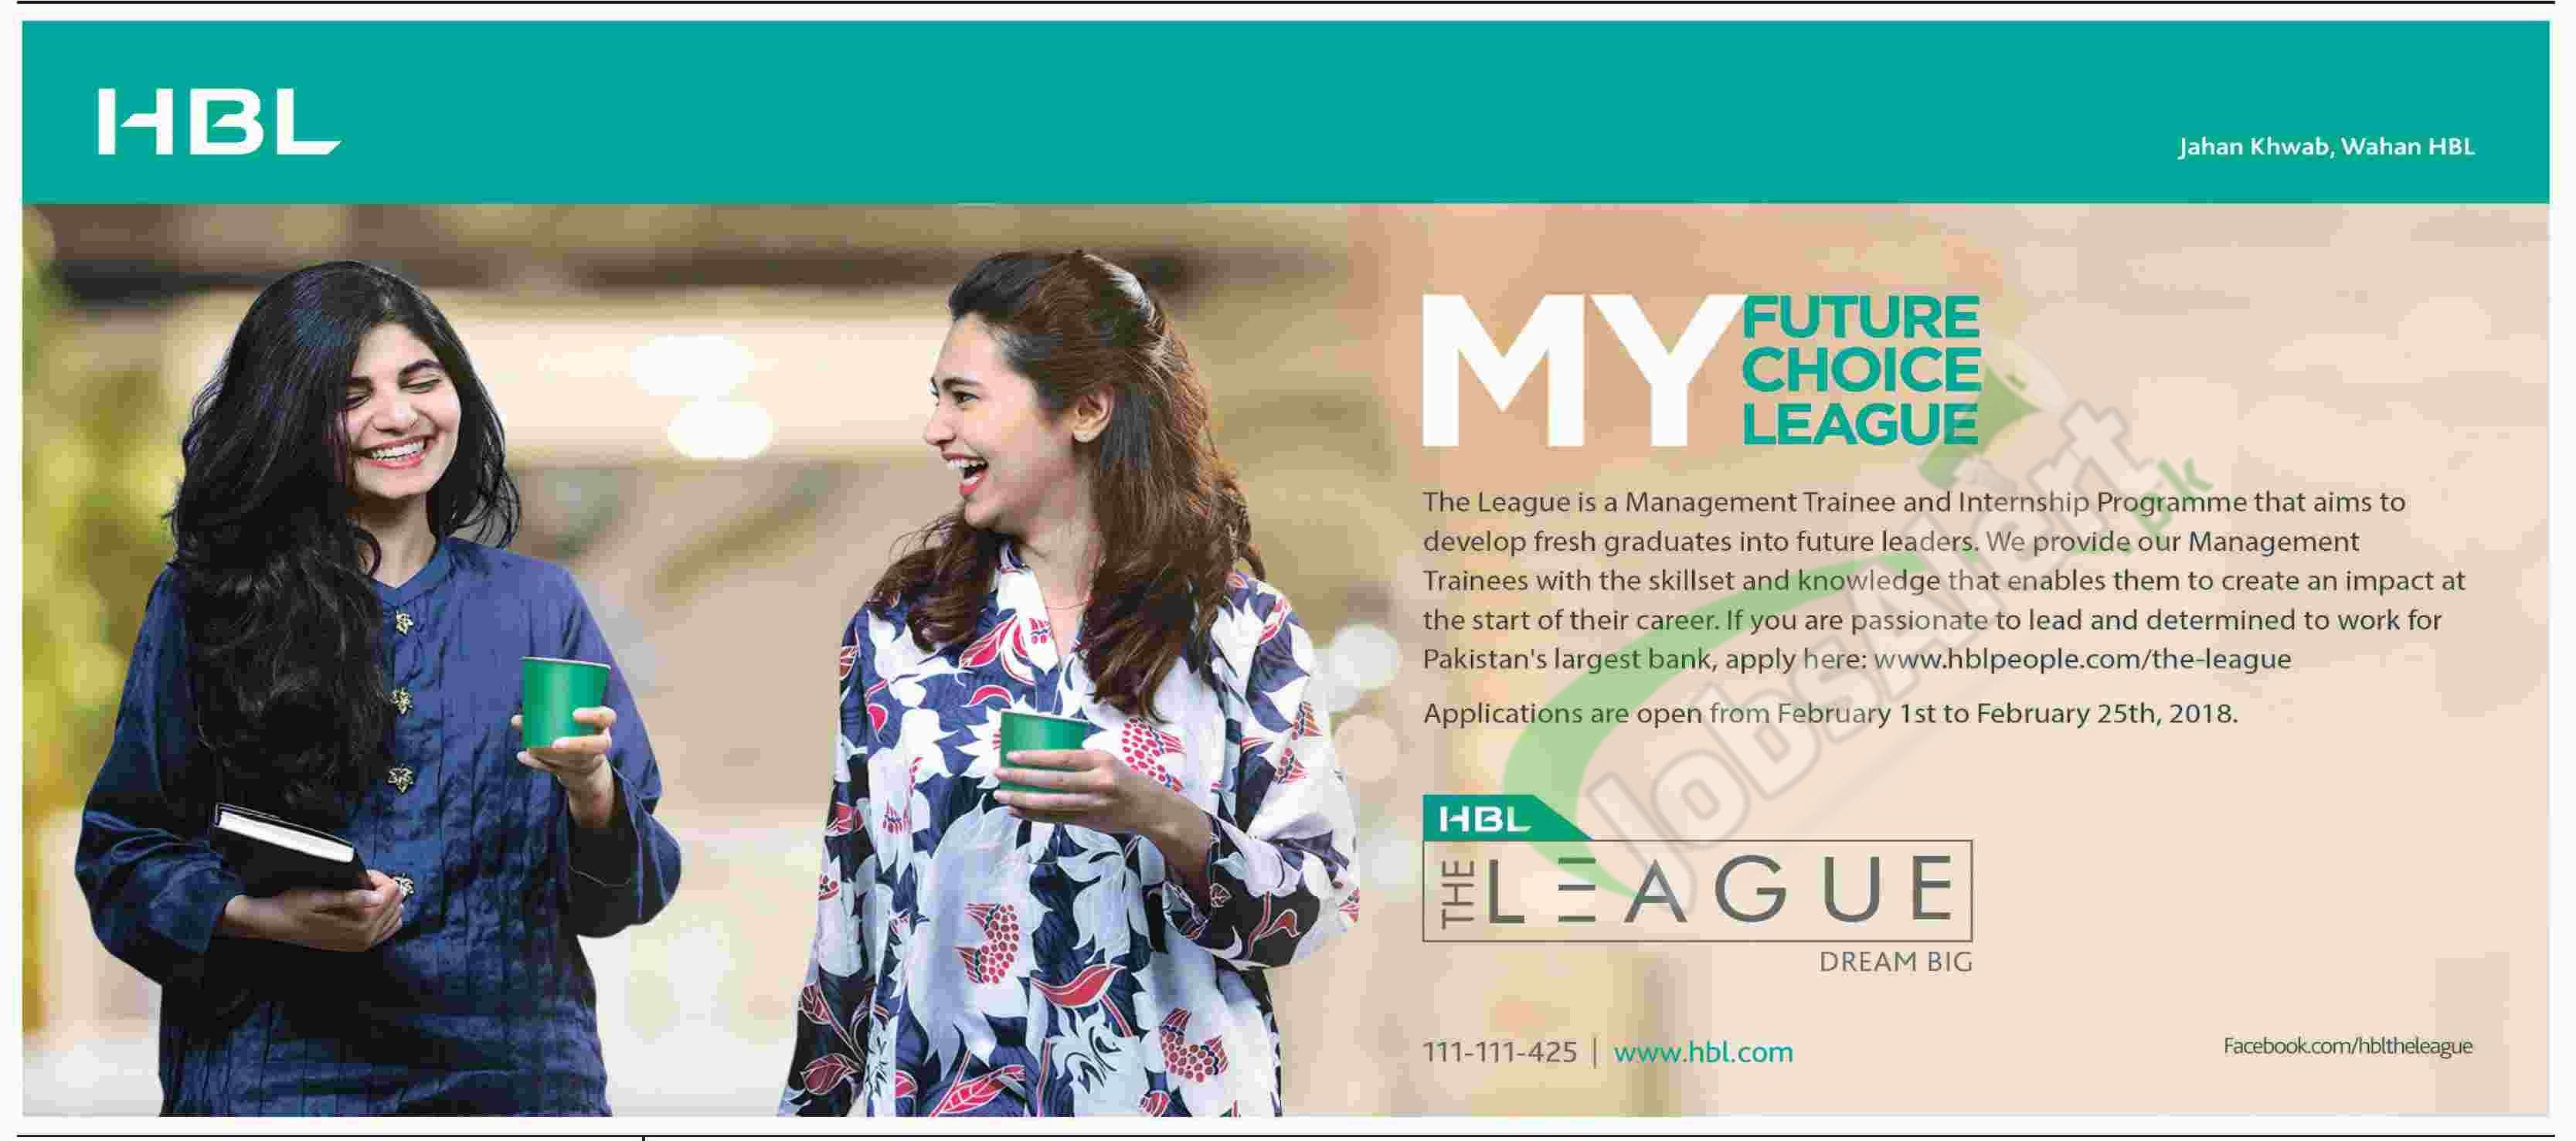 HBL Update: HBL MTO Program 2018 Management Trainee